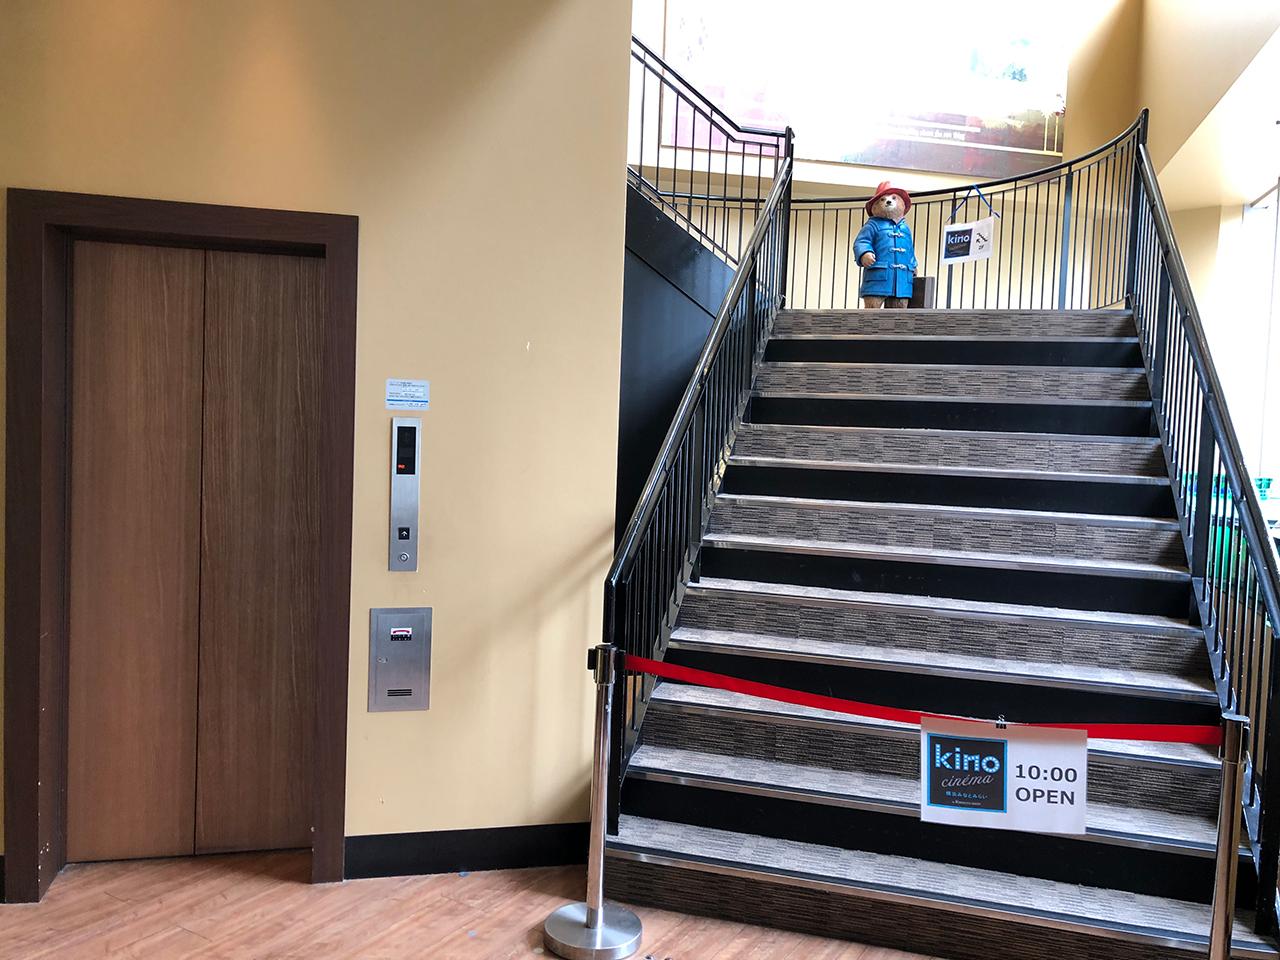 〈KINO cinema みなとみらい〉2階をつなぐ階段とエレベーター